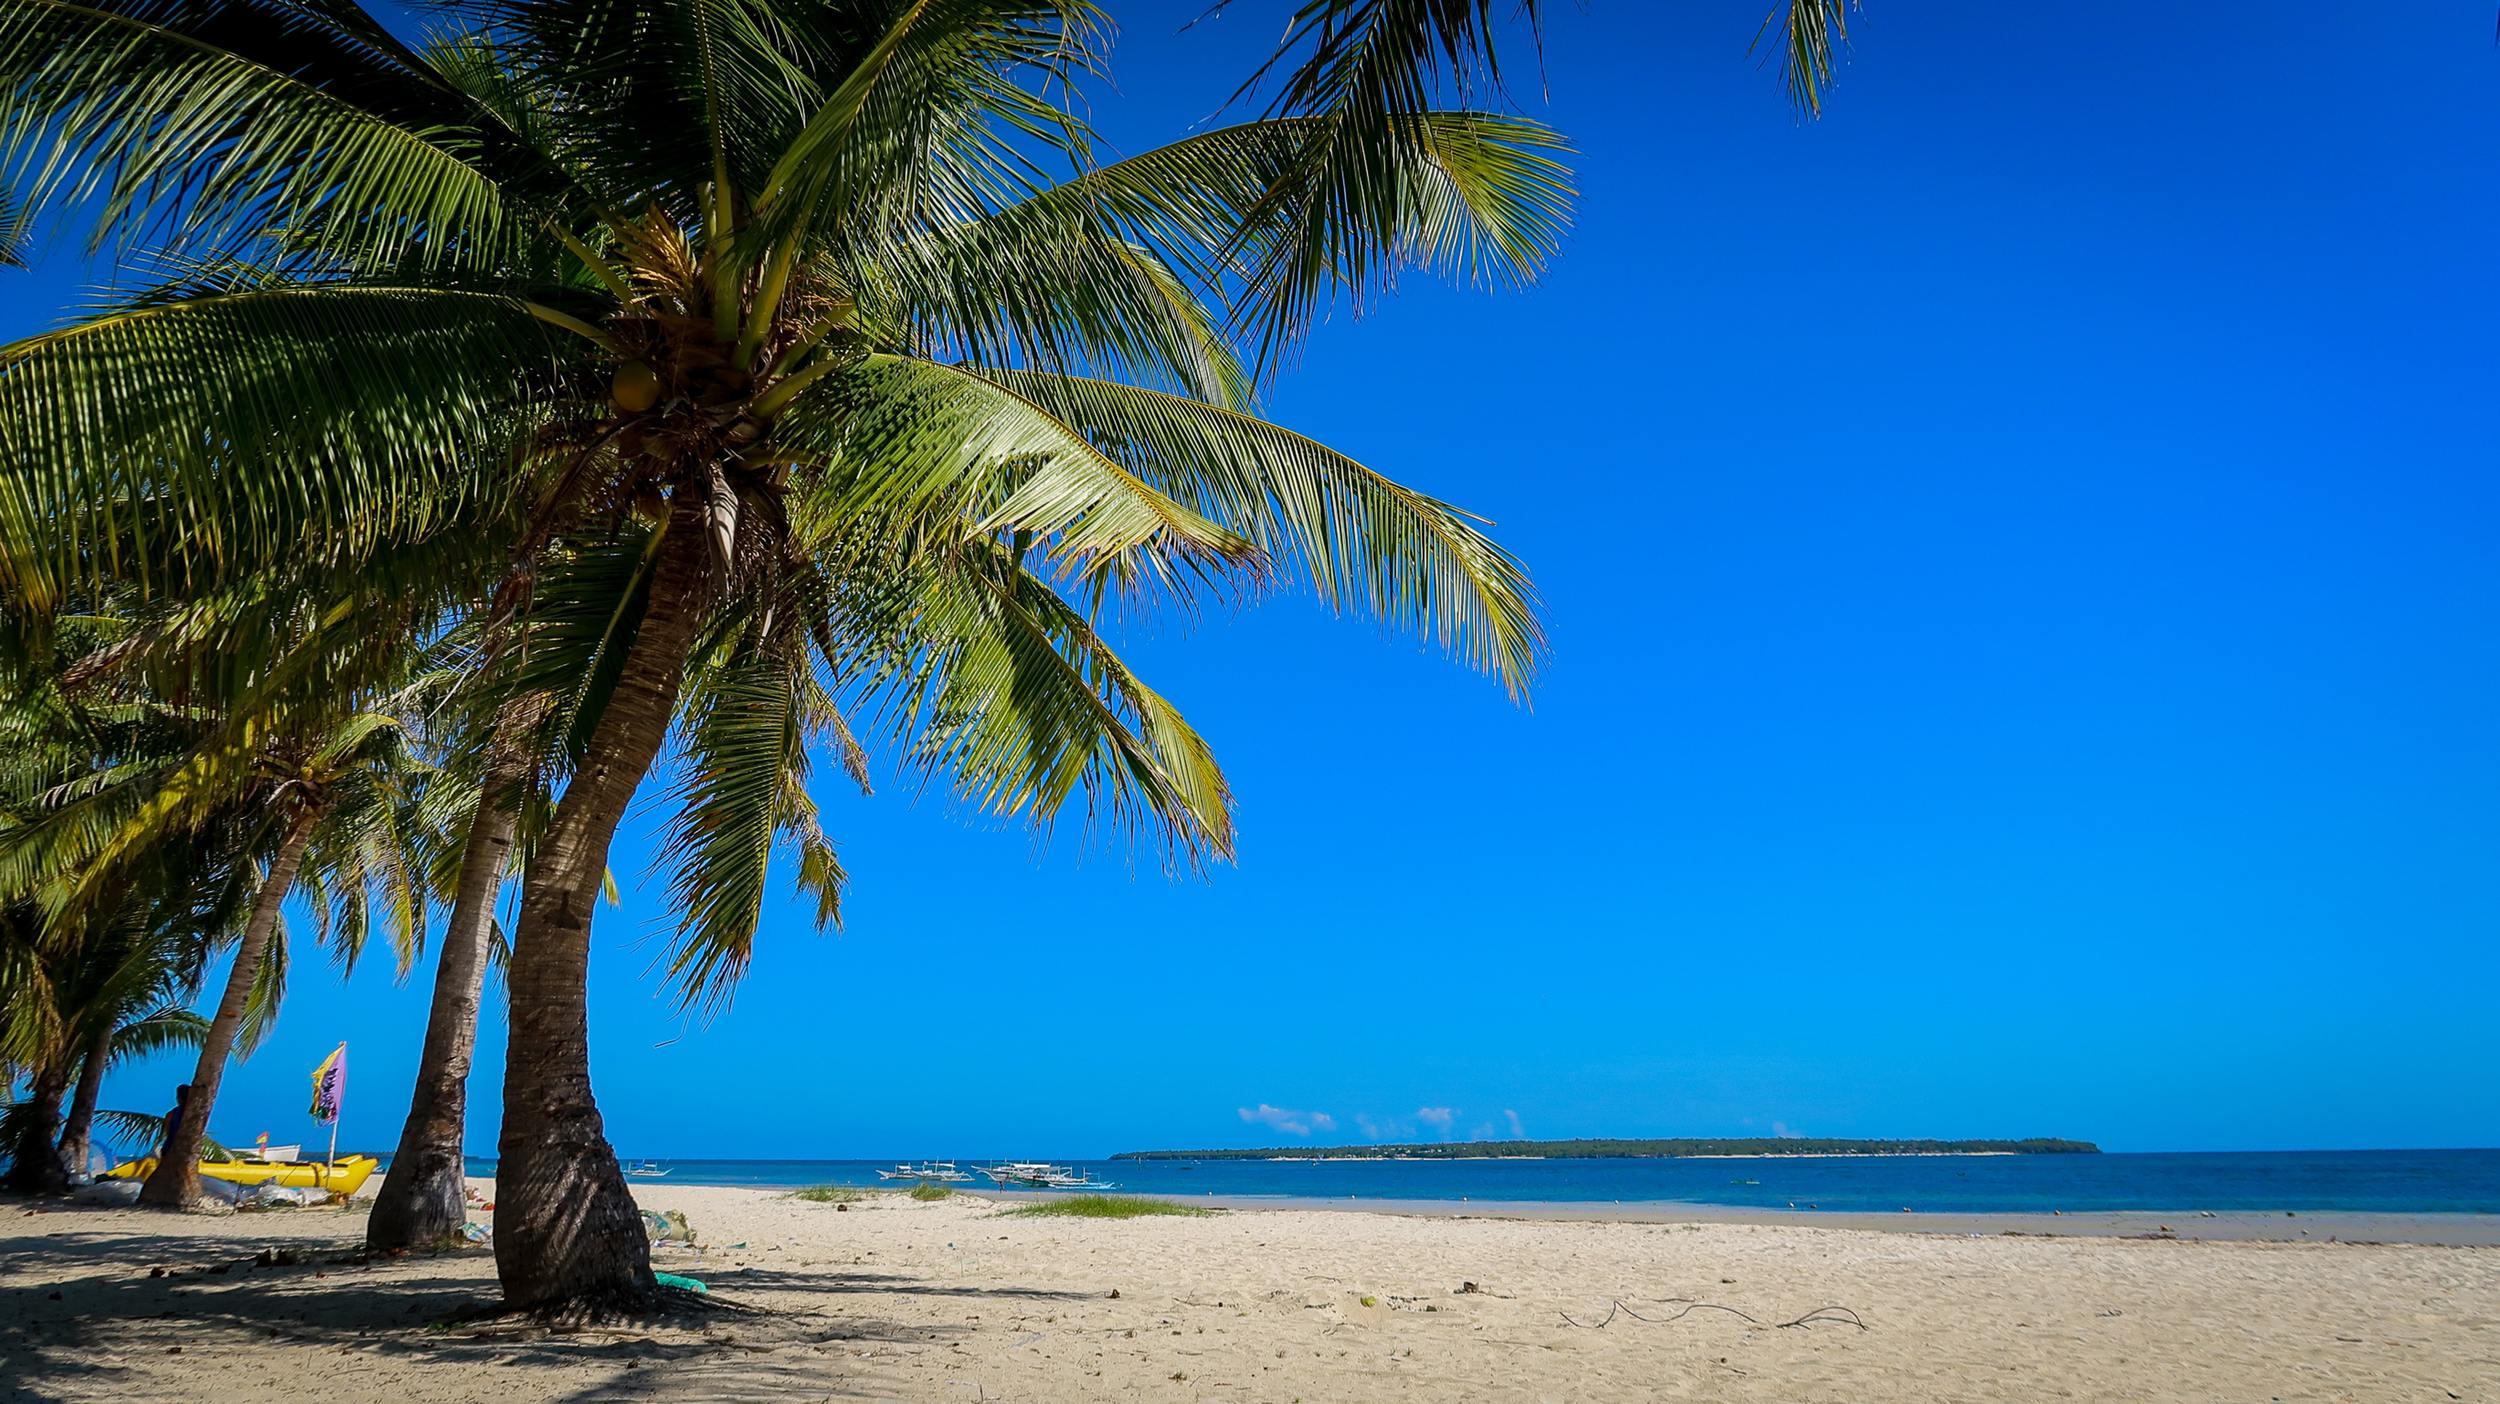 Best Beach Resorts in Cebu Top 10 Cebu Beach Resorts